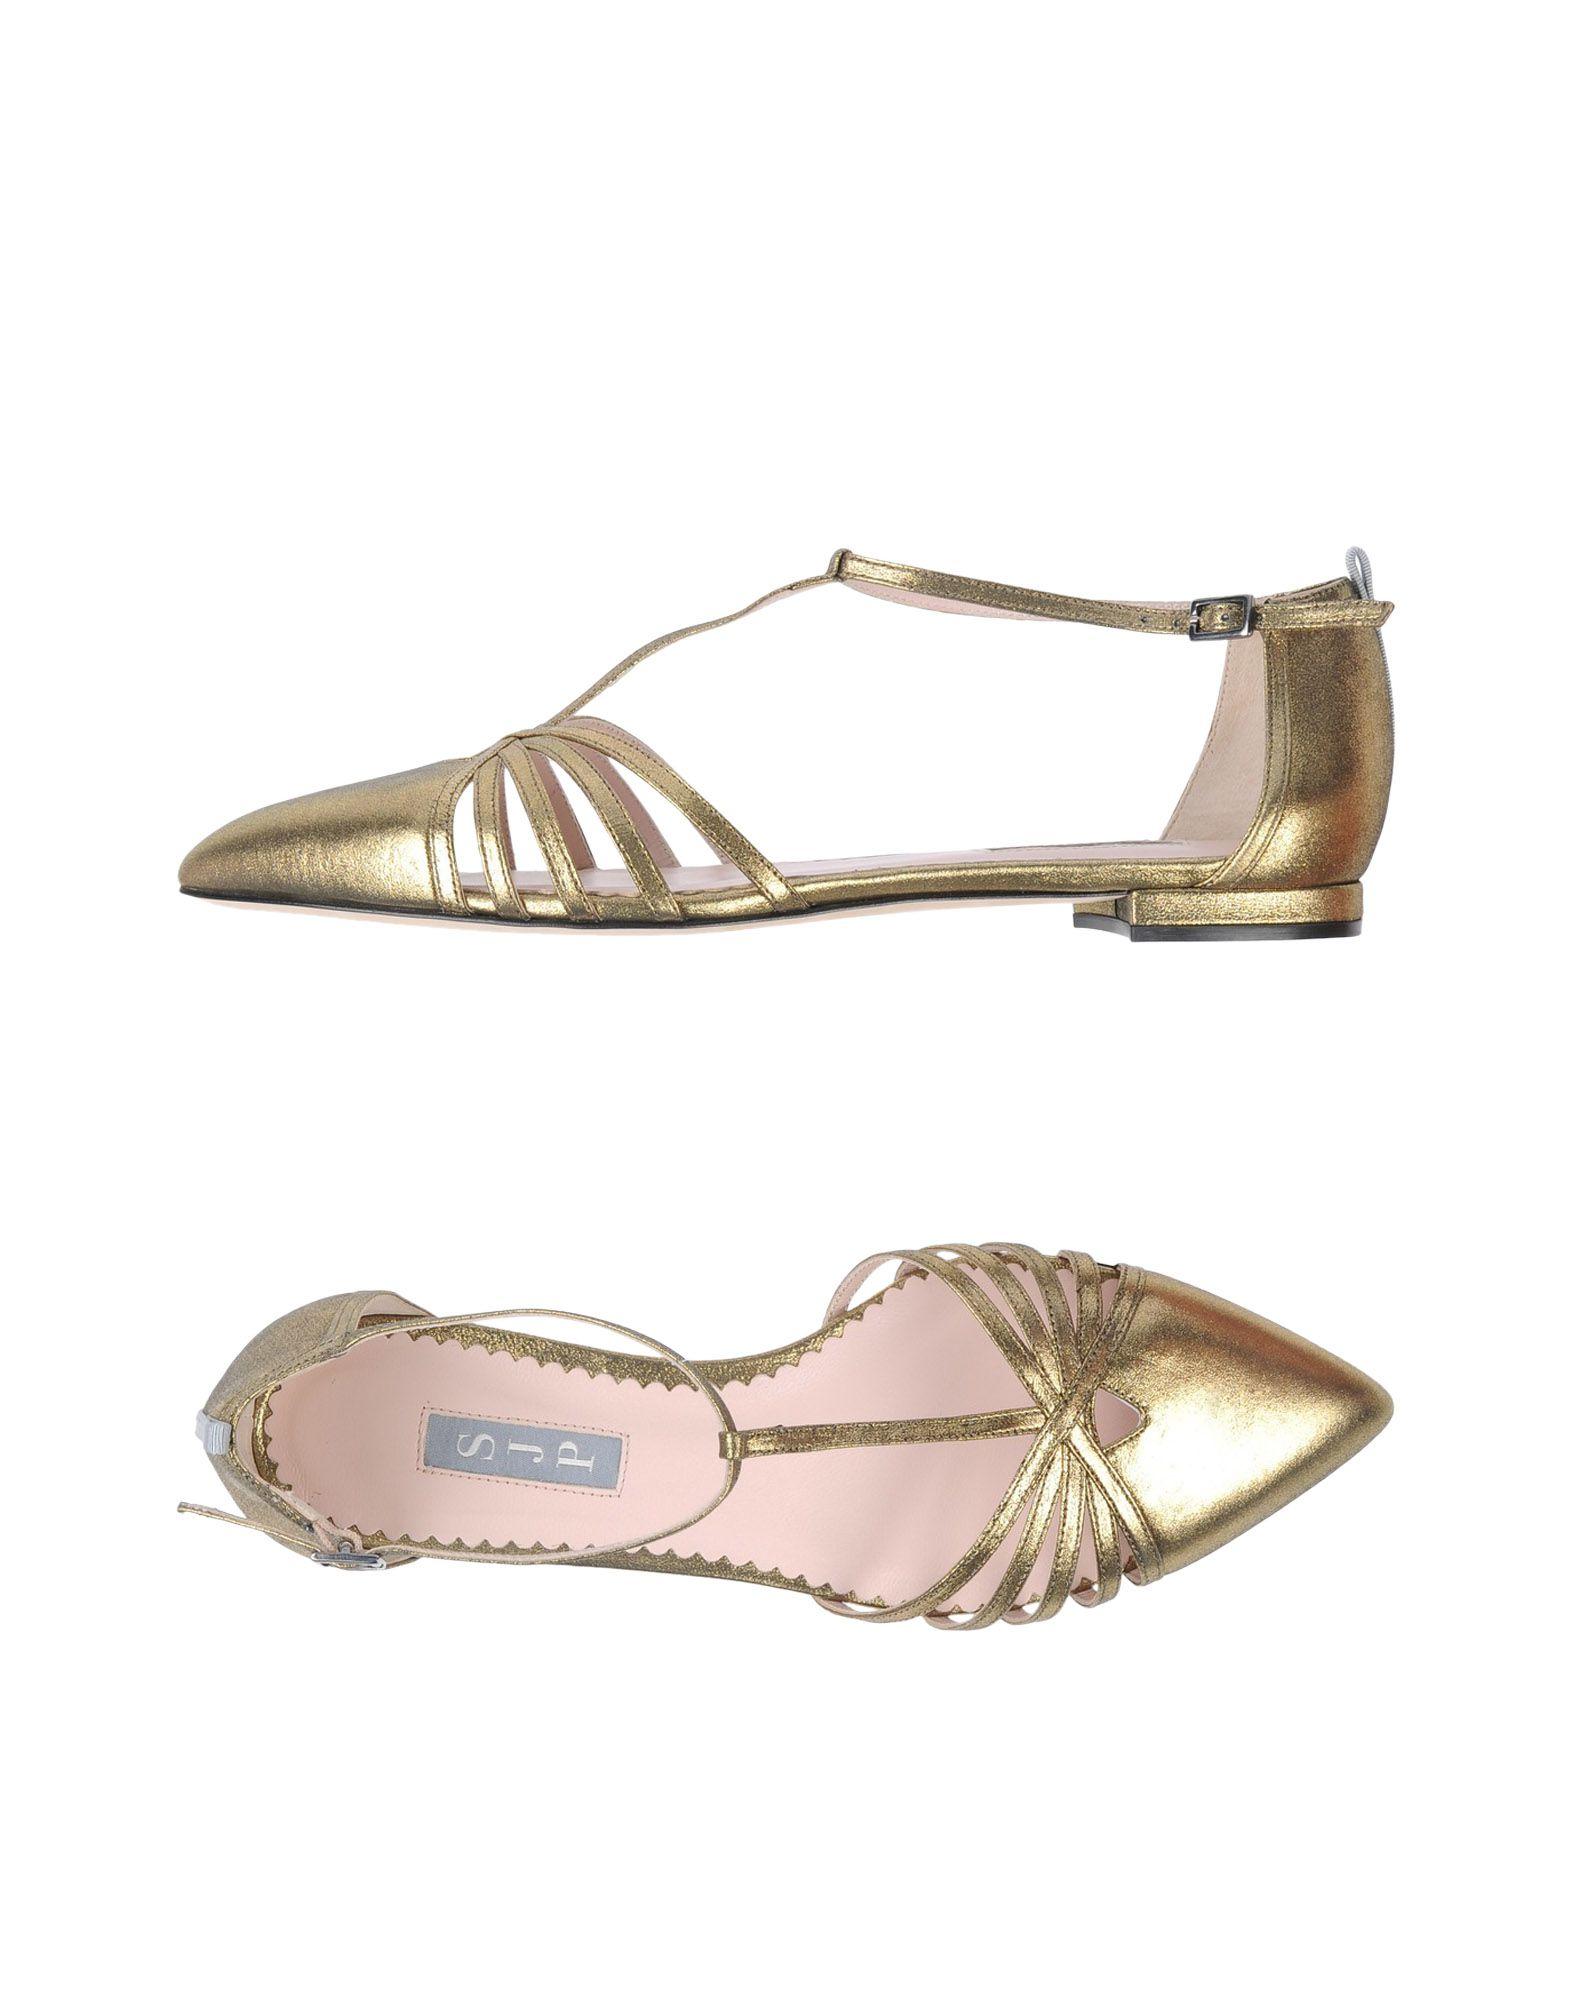 Stilvolle billige Schuhe Damen Sjp By Sarah Jessica Parker Ballerinas Damen Schuhe  11477332KW 9199f1